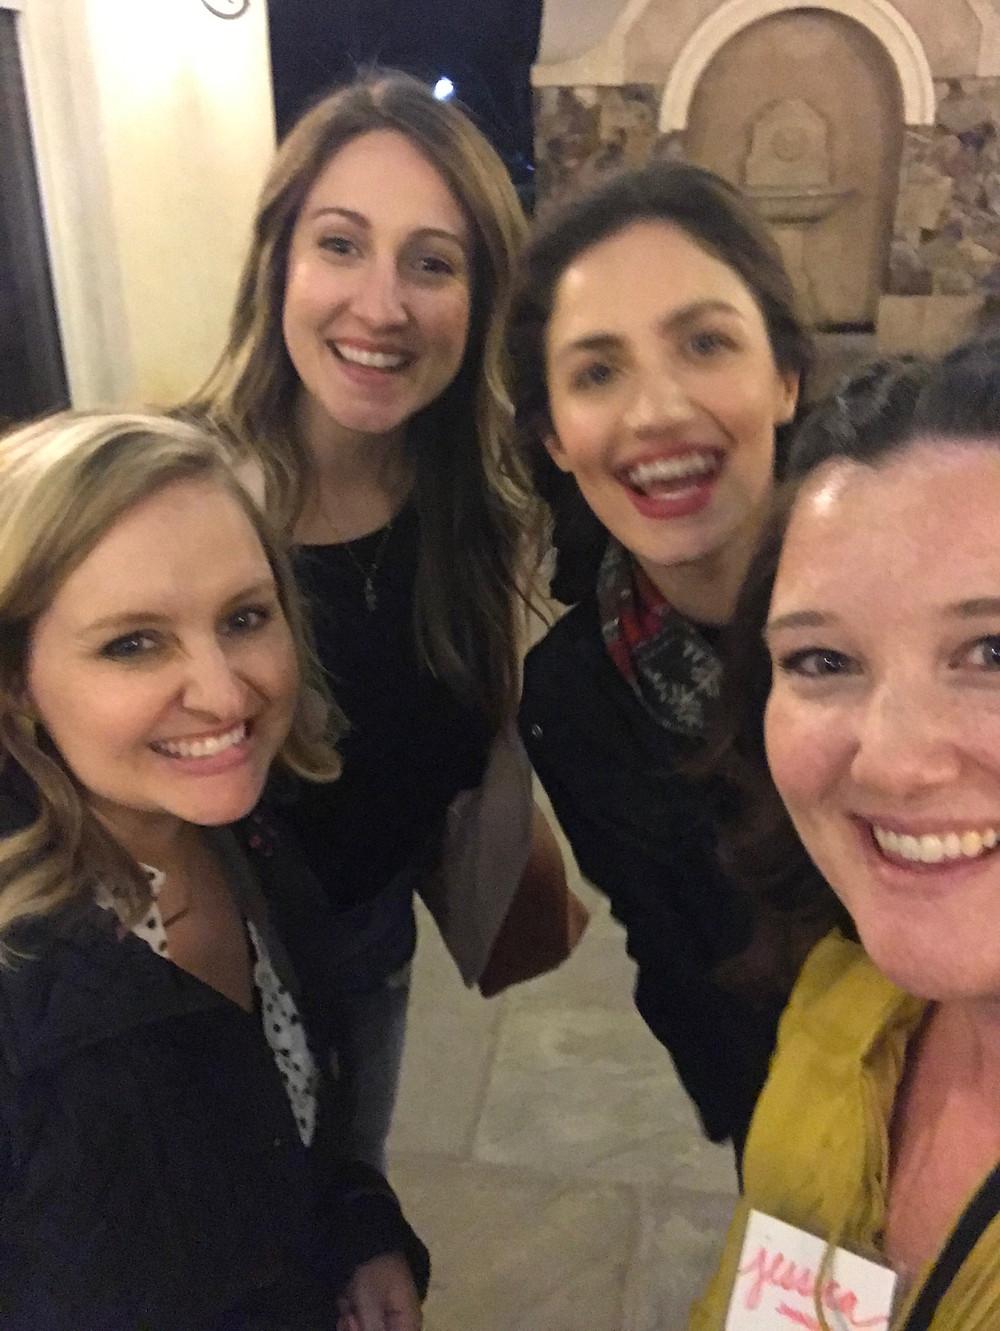 Meredith Johnston, Sam Ray, Joanne Maye, Myself